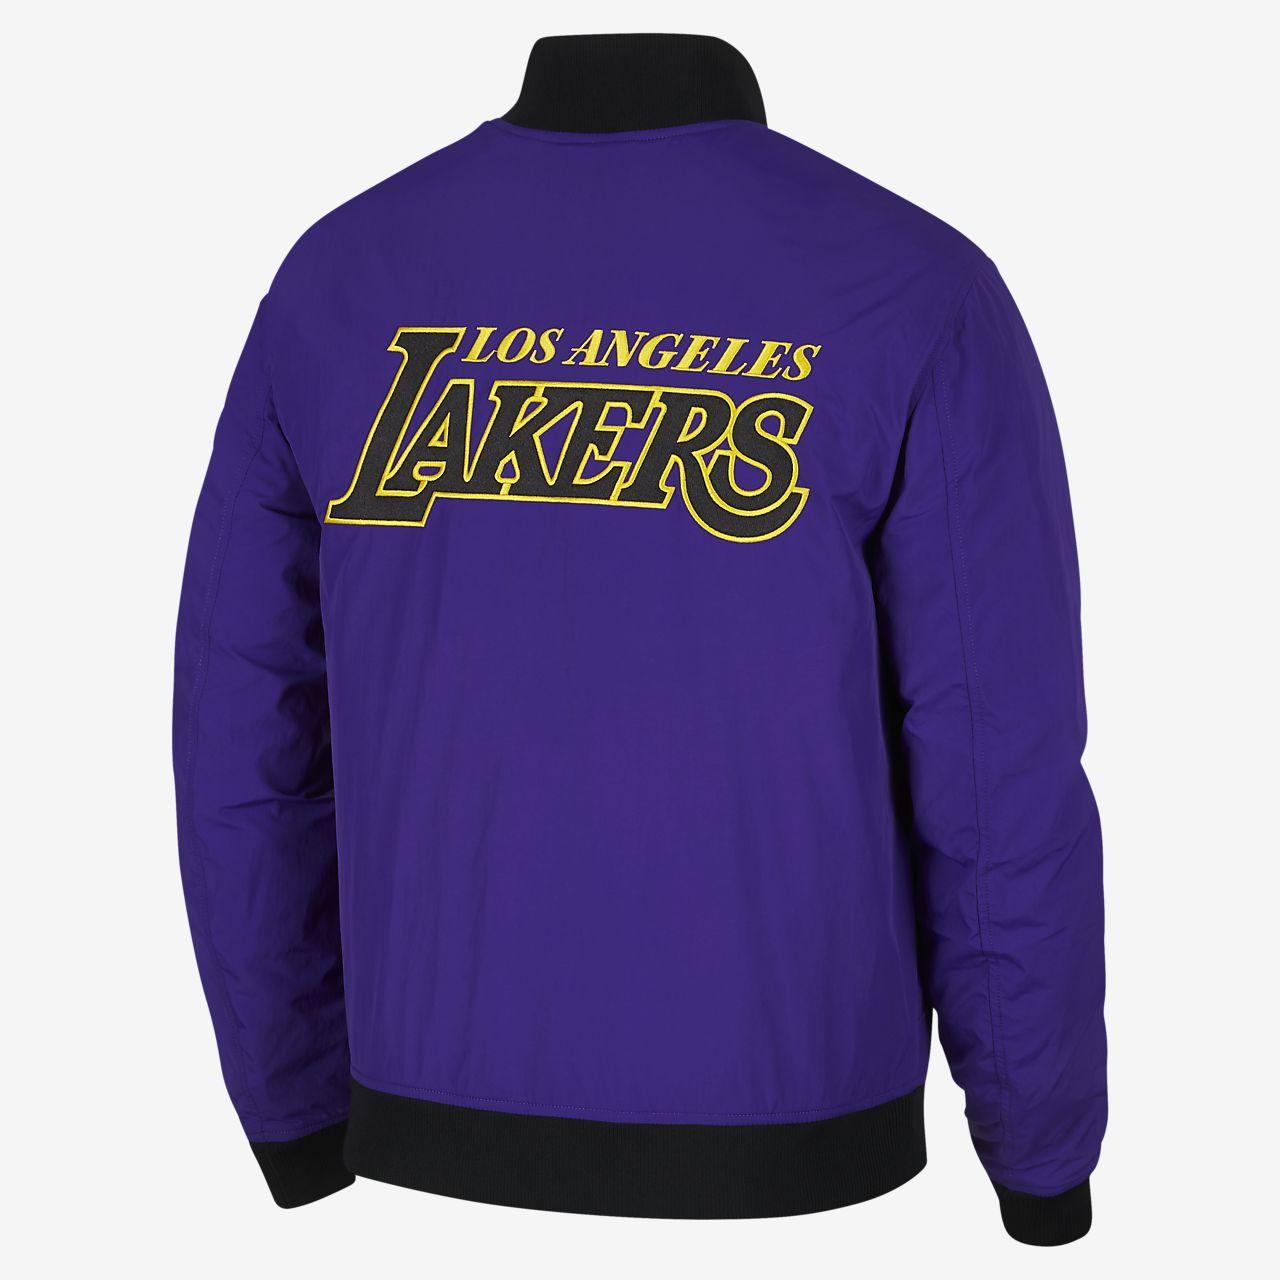 67ad5afef689 Los Angeles Lakers Nike Courtside Men s NBA Jacket. Nike.com